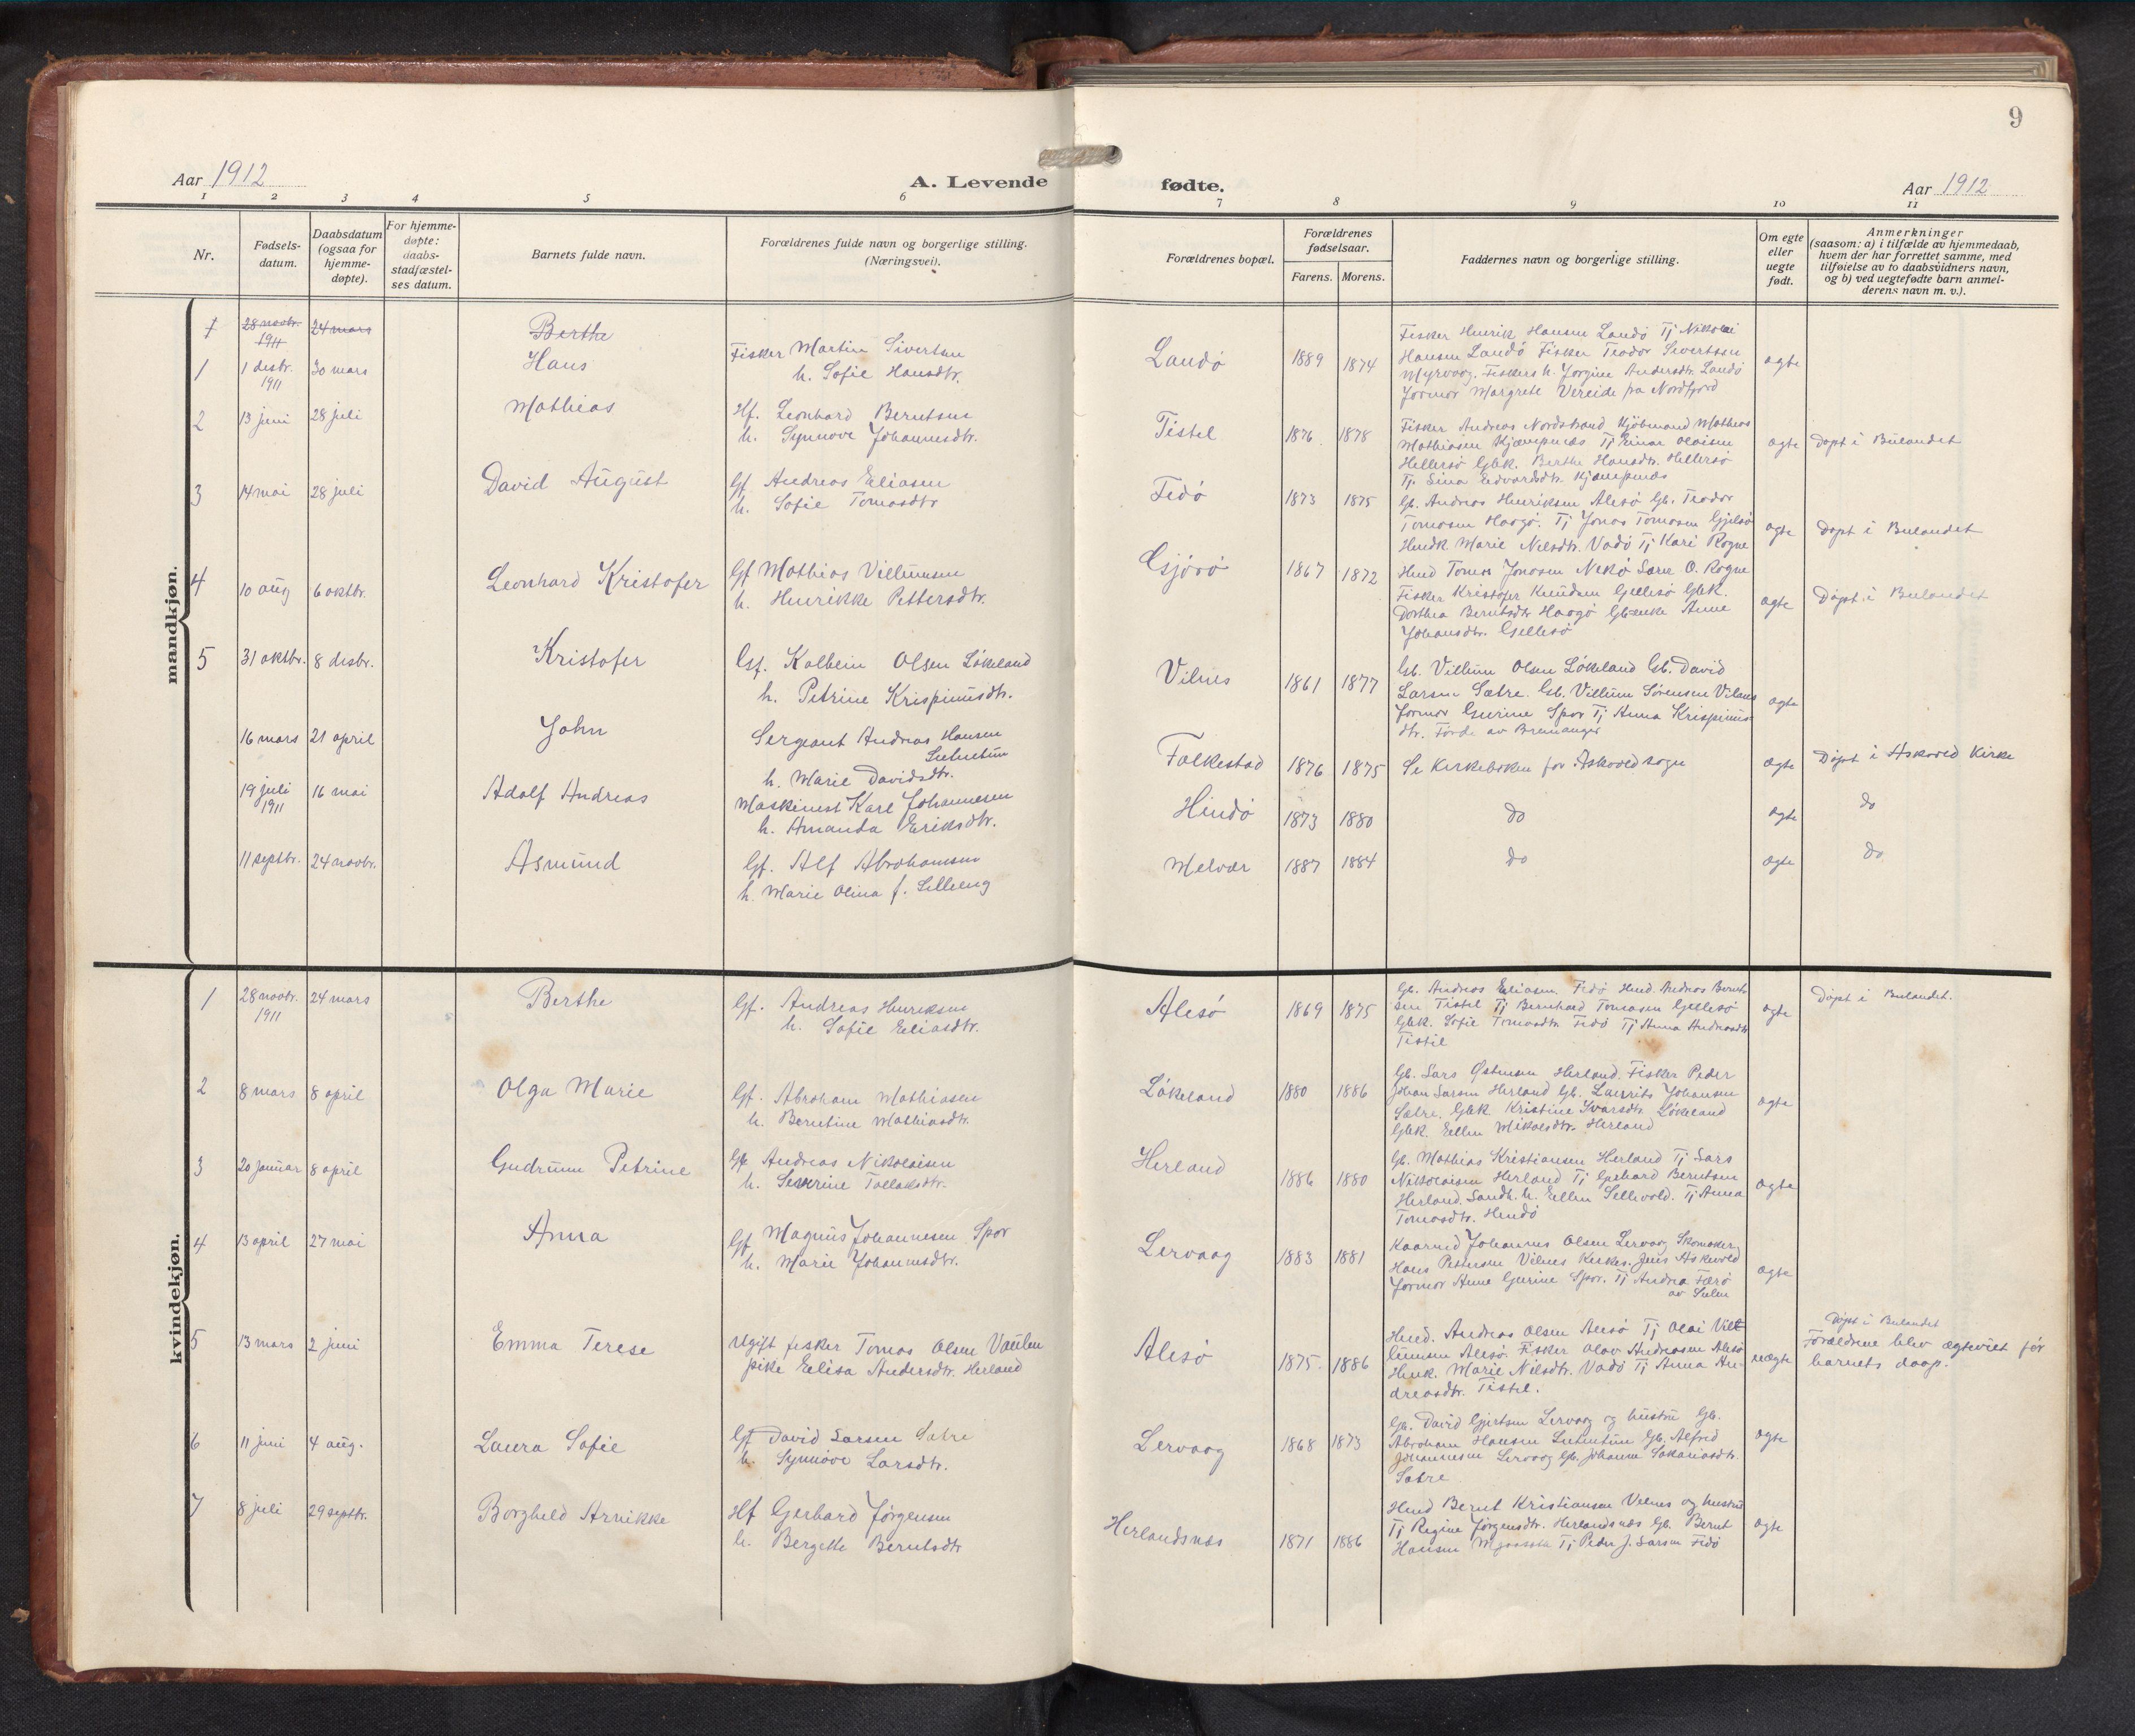 SAB, Askvoll sokneprestembete, H/Hab/Habb/L0002: Klokkerbok nr. B 2, 1910-1947, s. 8b-9a